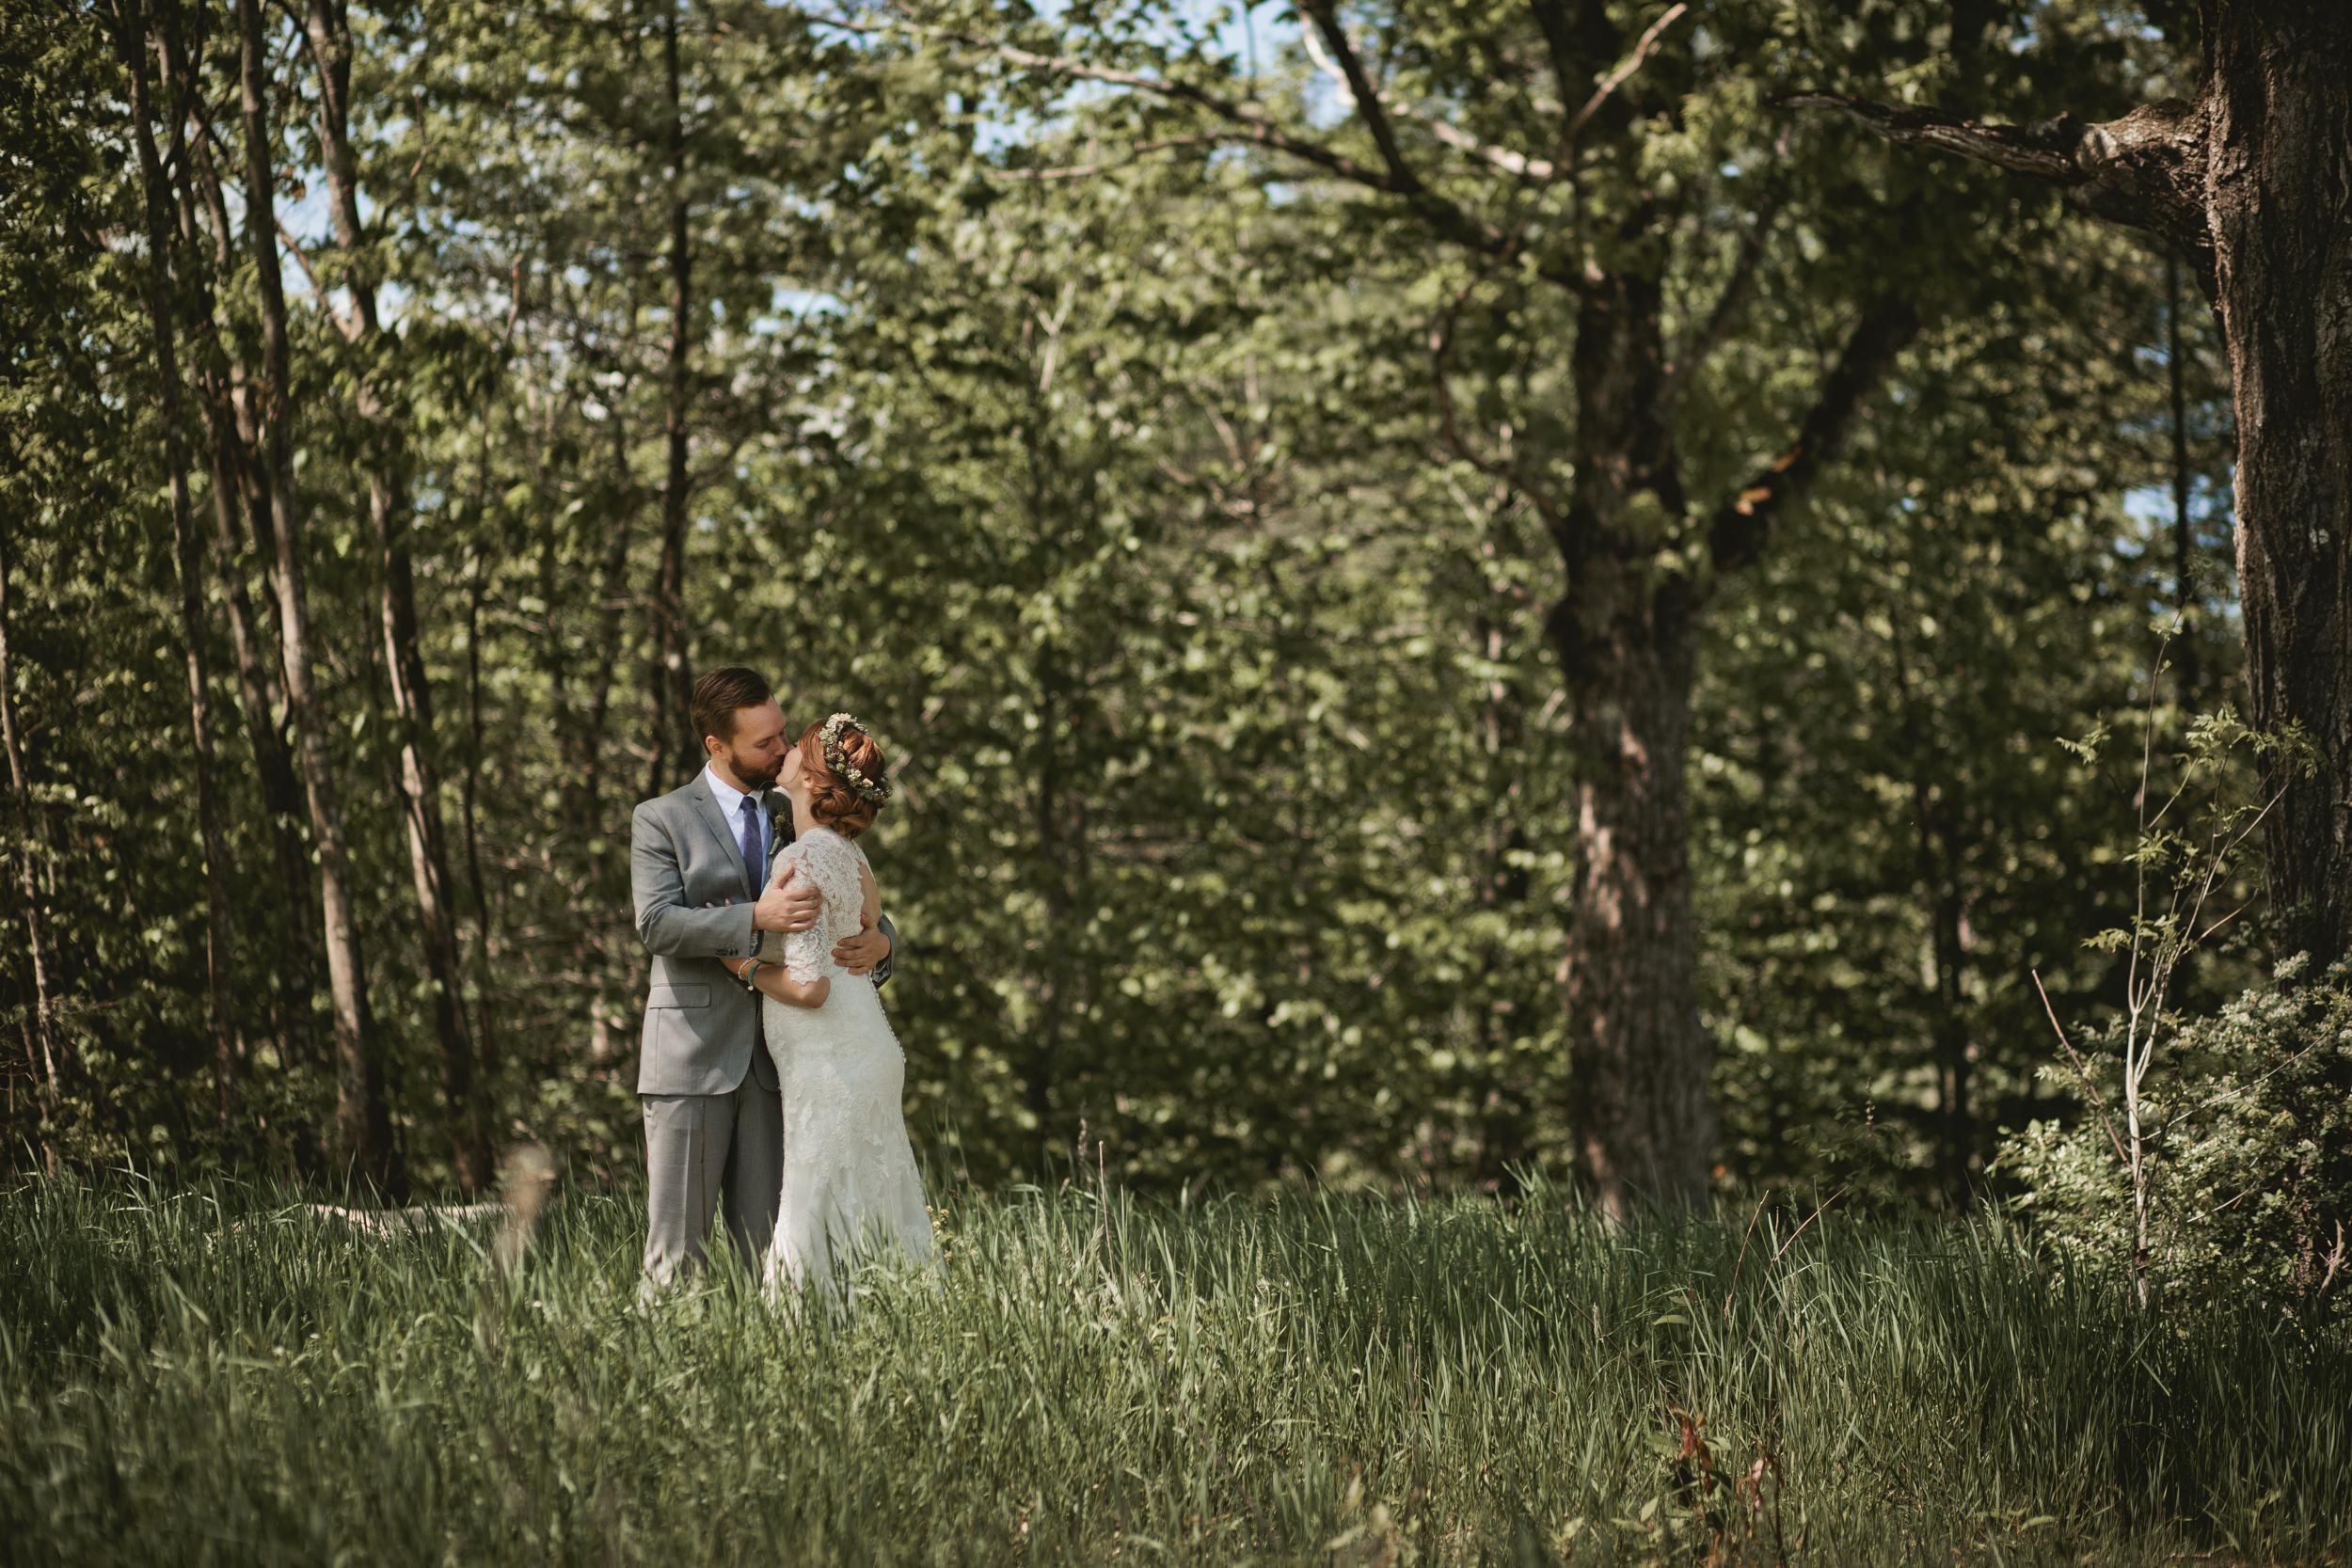 Spring-Meadows-Maine-Wedding-92.jpg